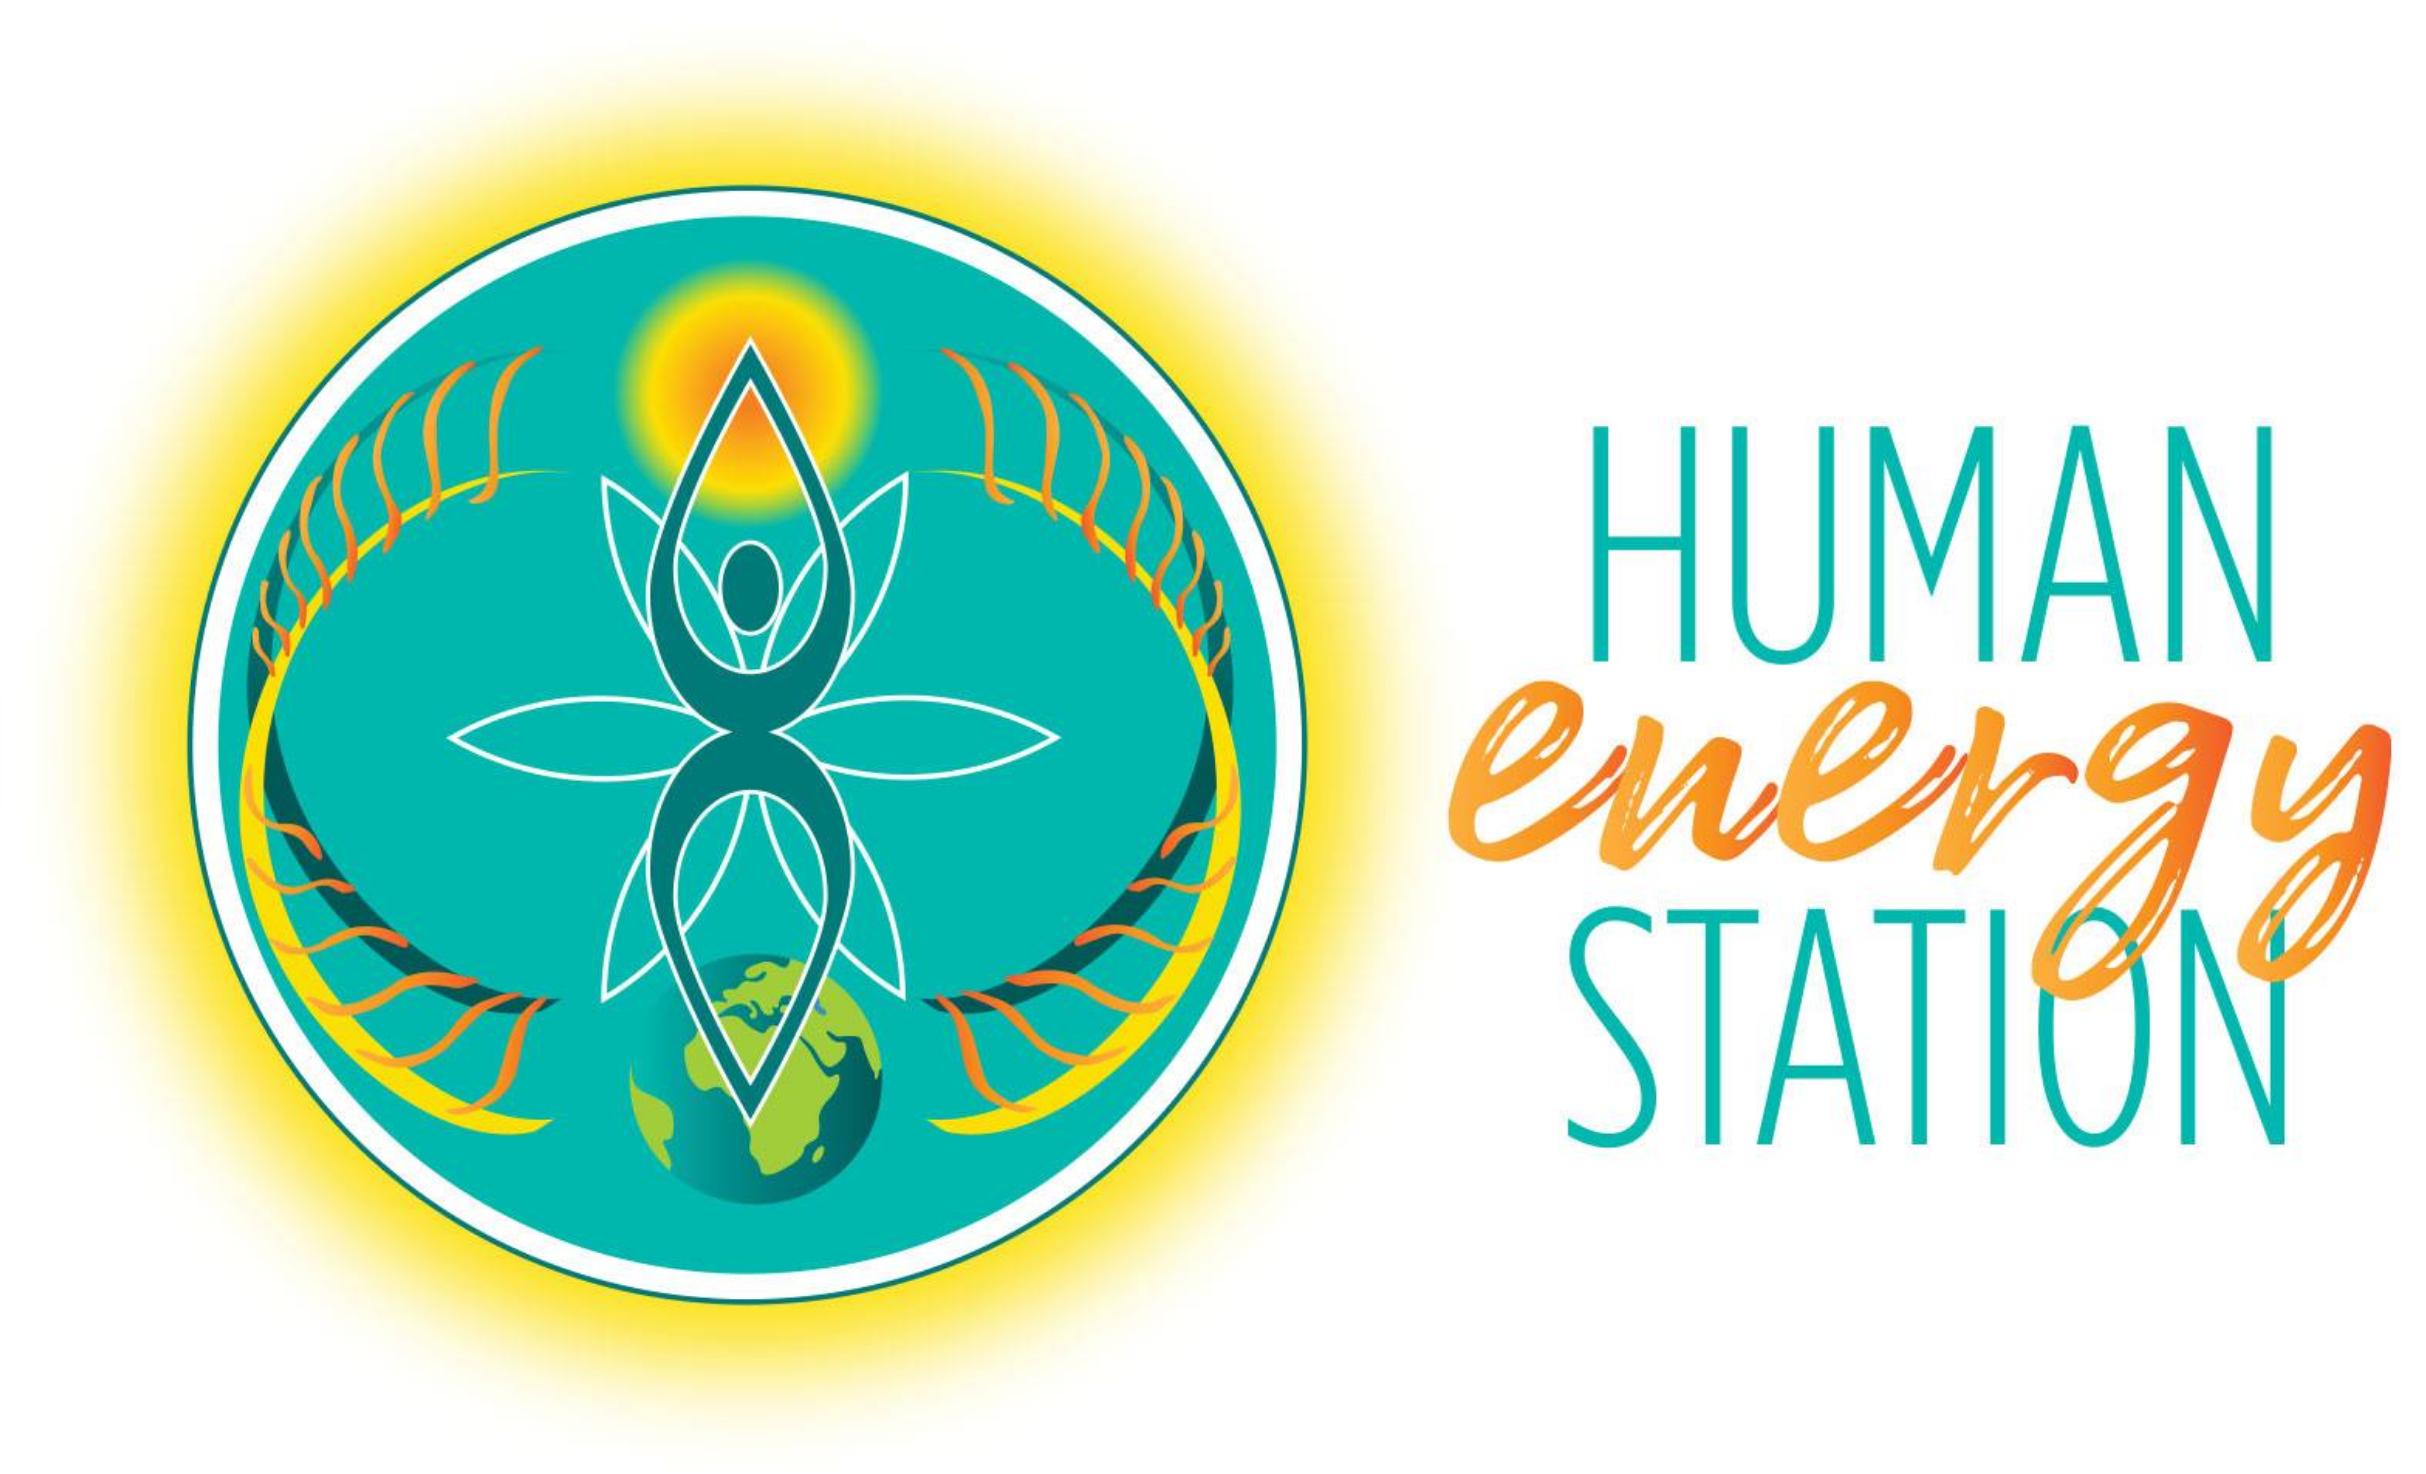 Human Energy Station professional logo design